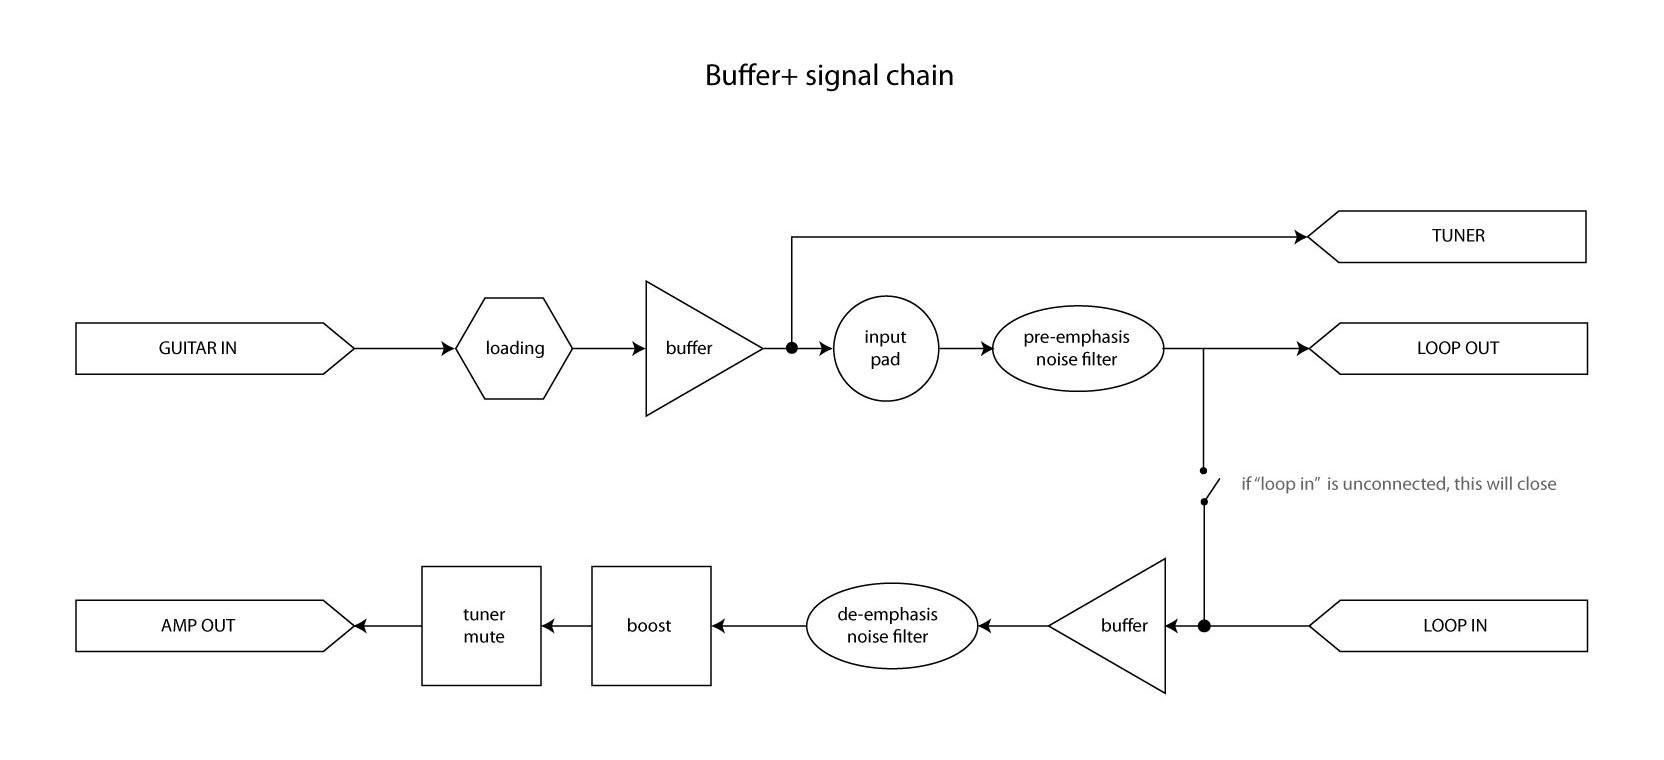 buffer+-signal-chain-block-diagram